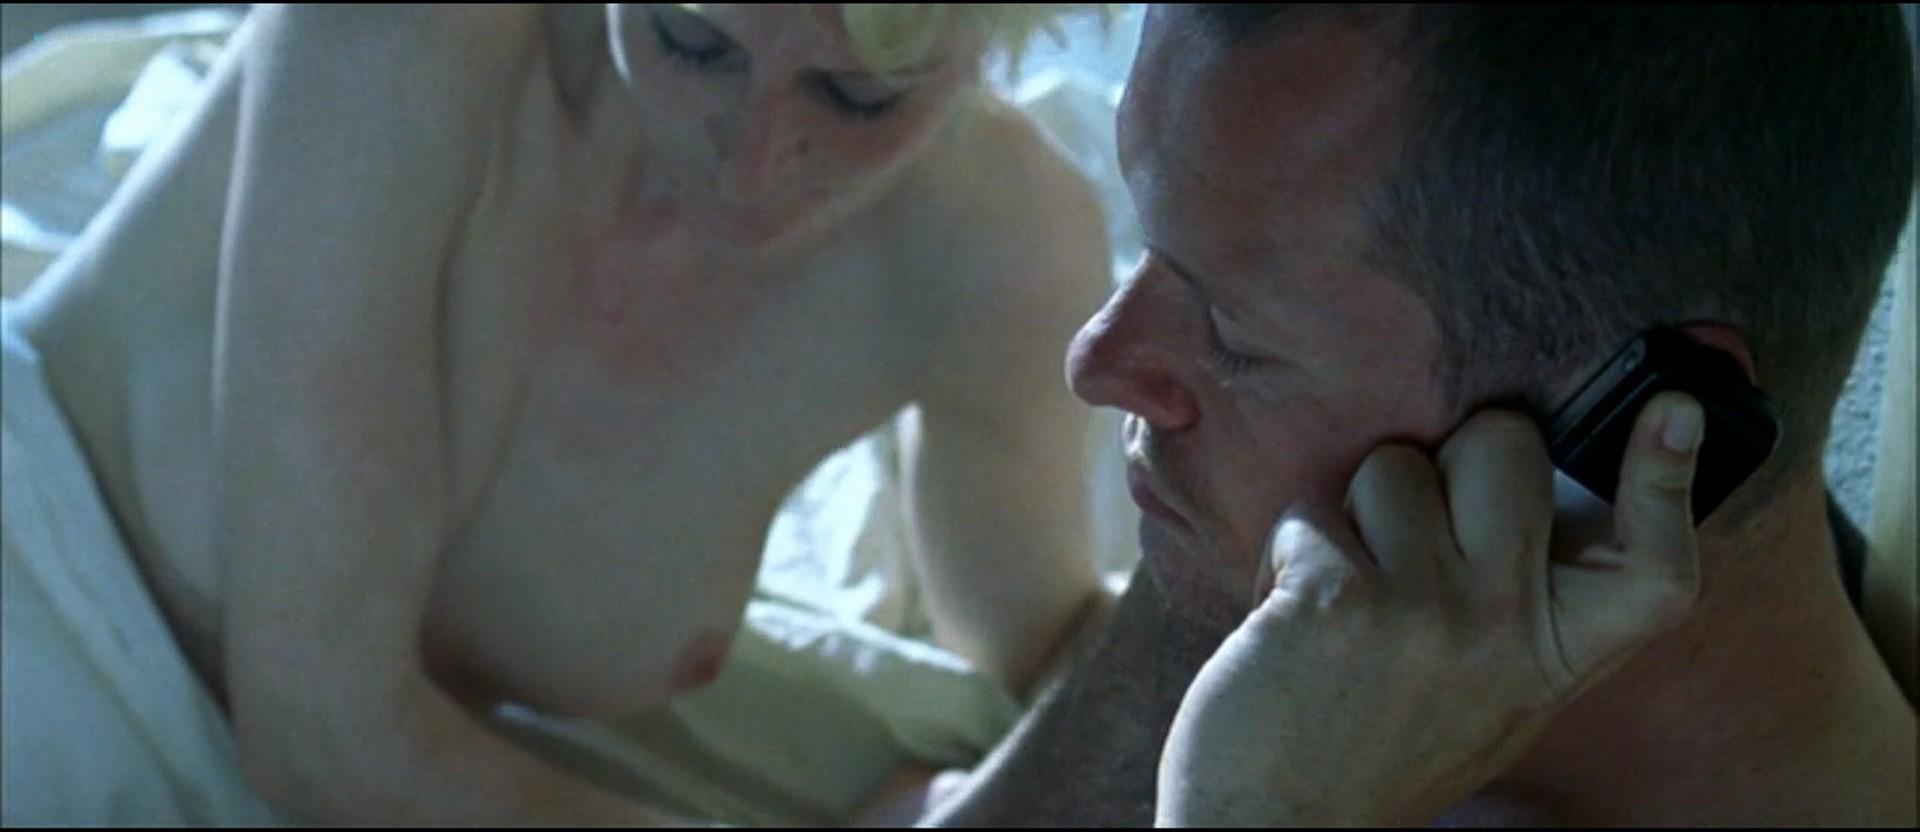 Signe Egholm Olsen nude hot sex Pernille Vallentin nude sex too - Nordkraft (DK-2005) HD 1080p Web (3)